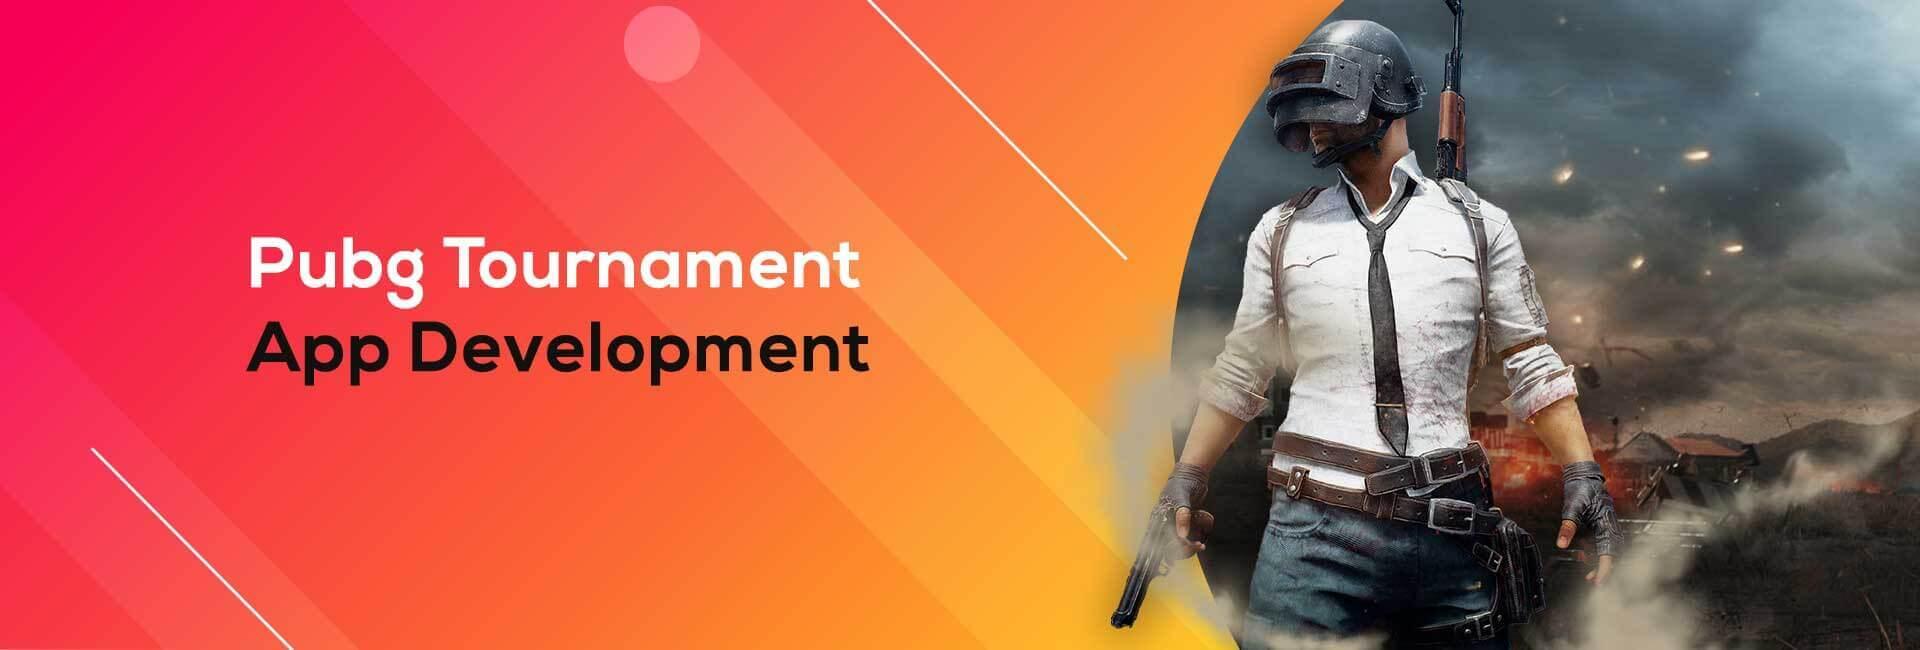 Pubg Tournament App Development